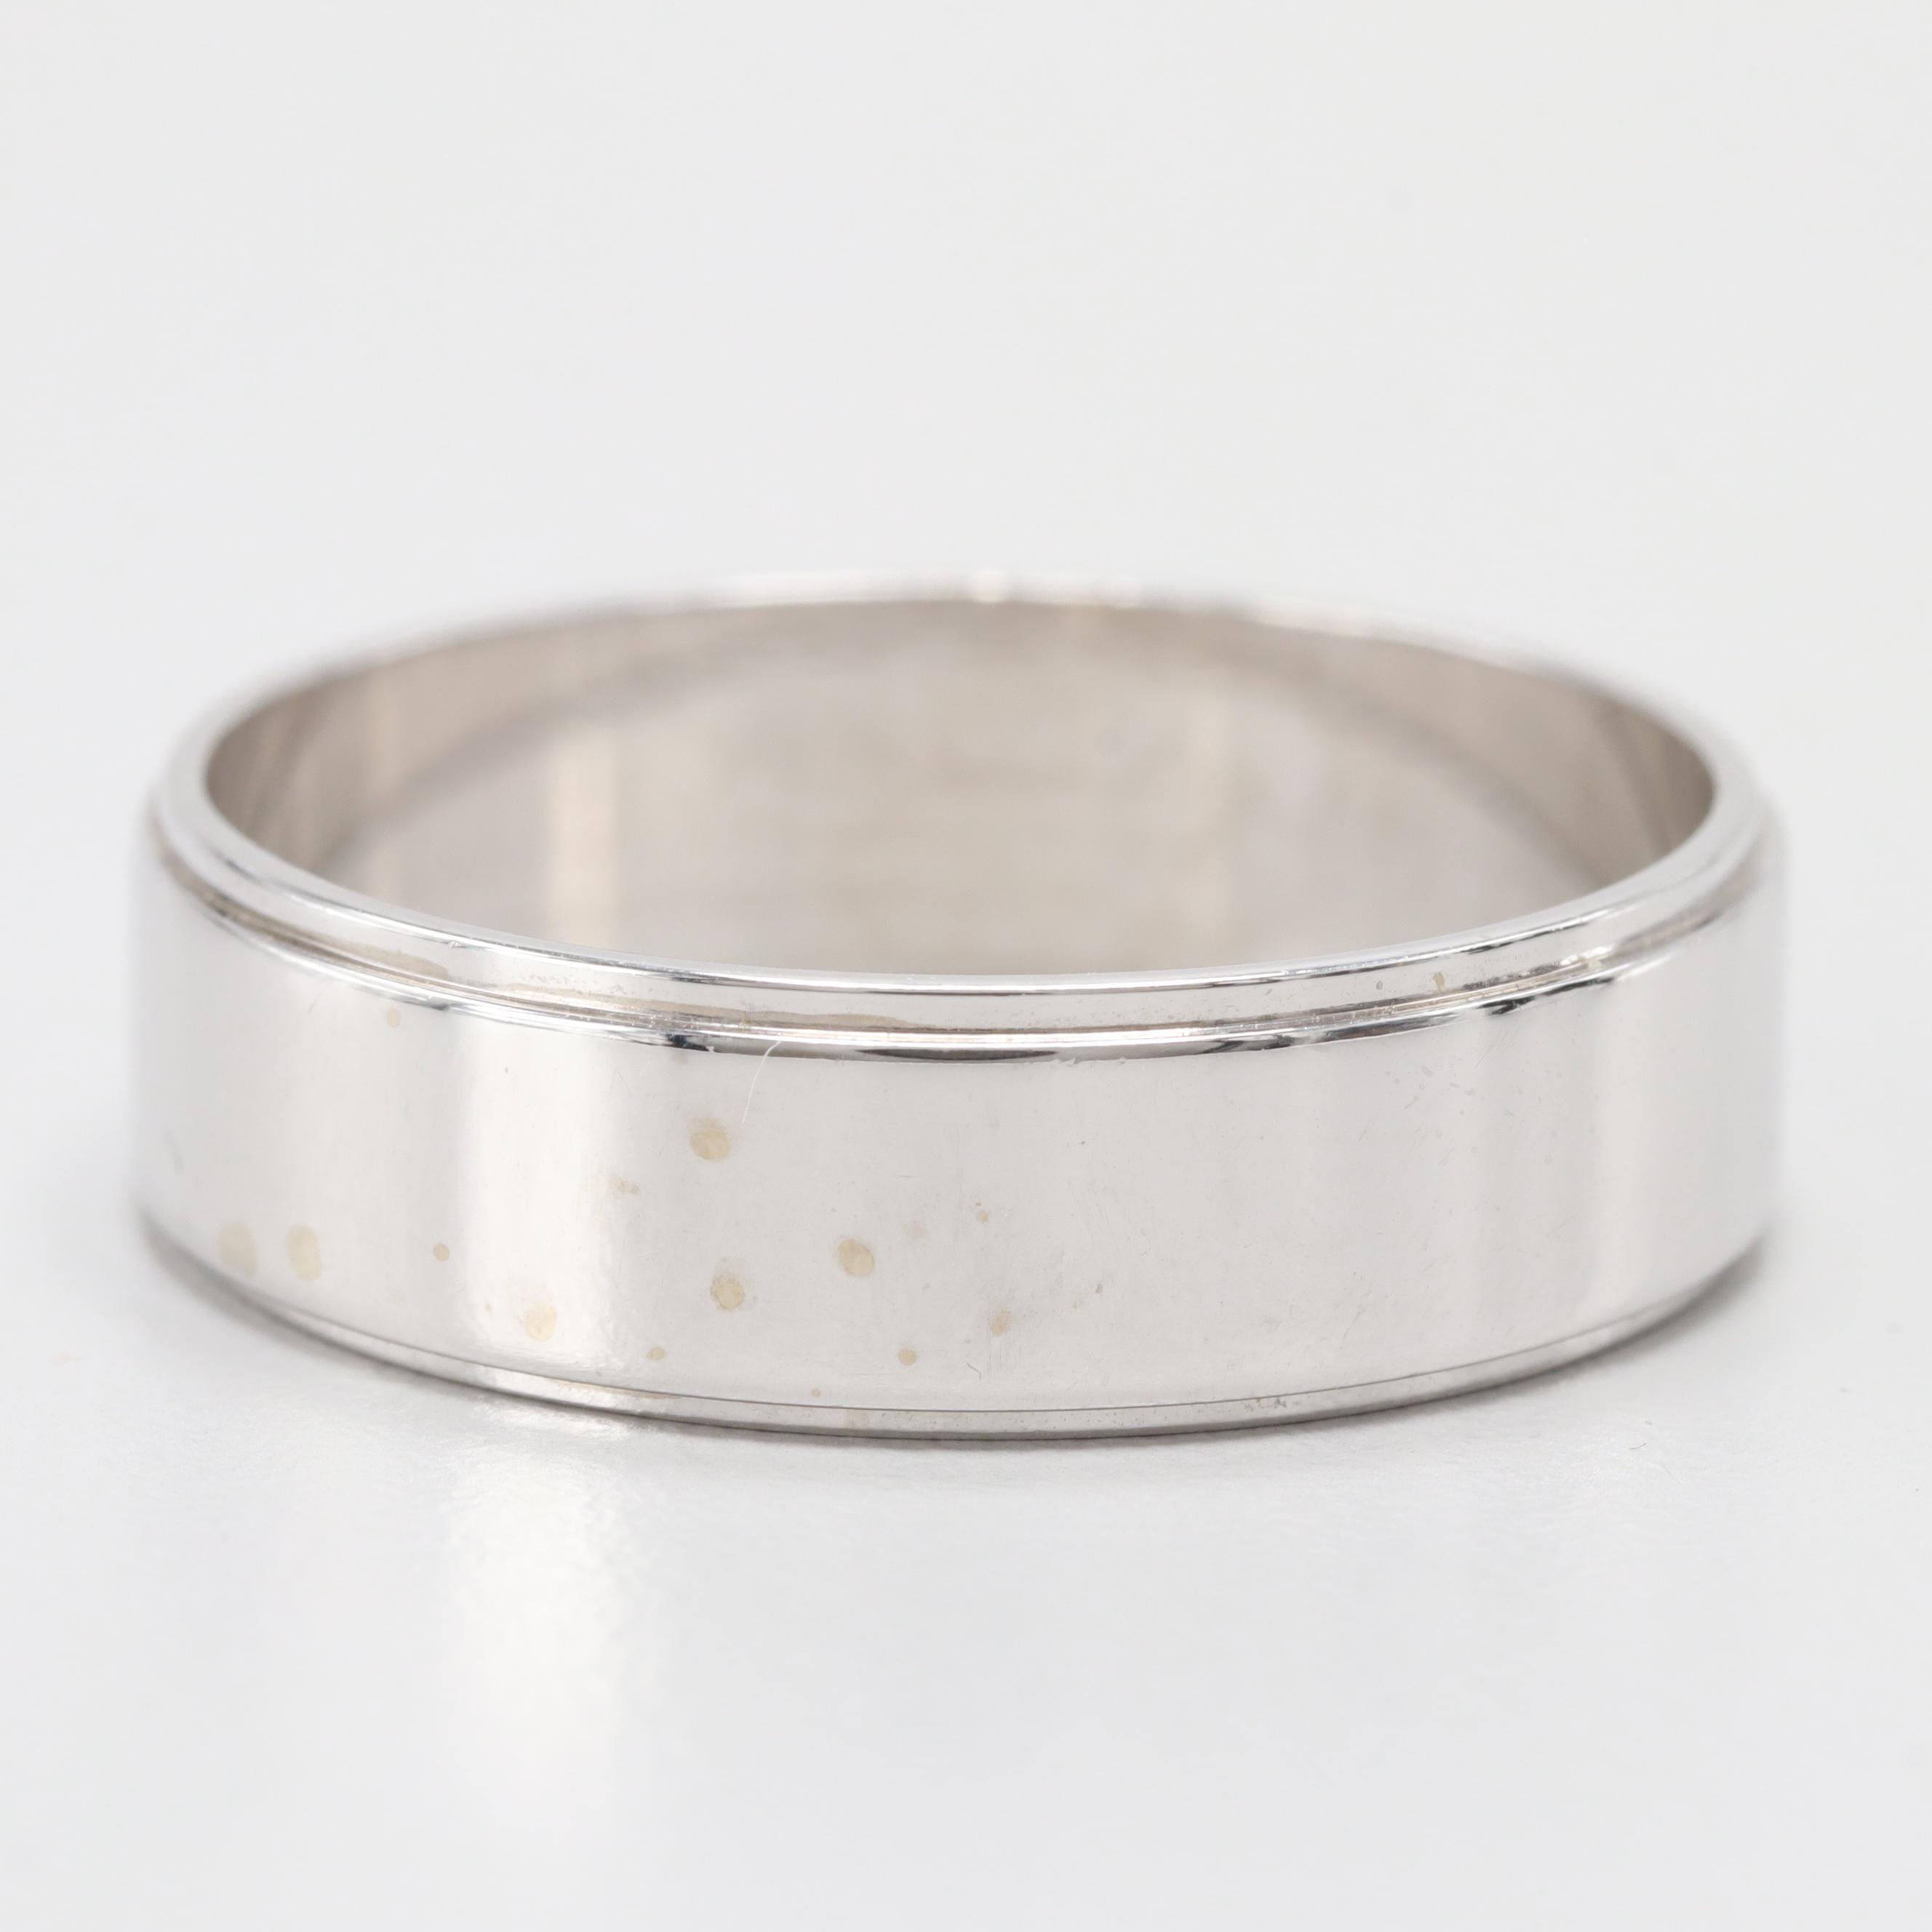 14K White Gold Ring Band